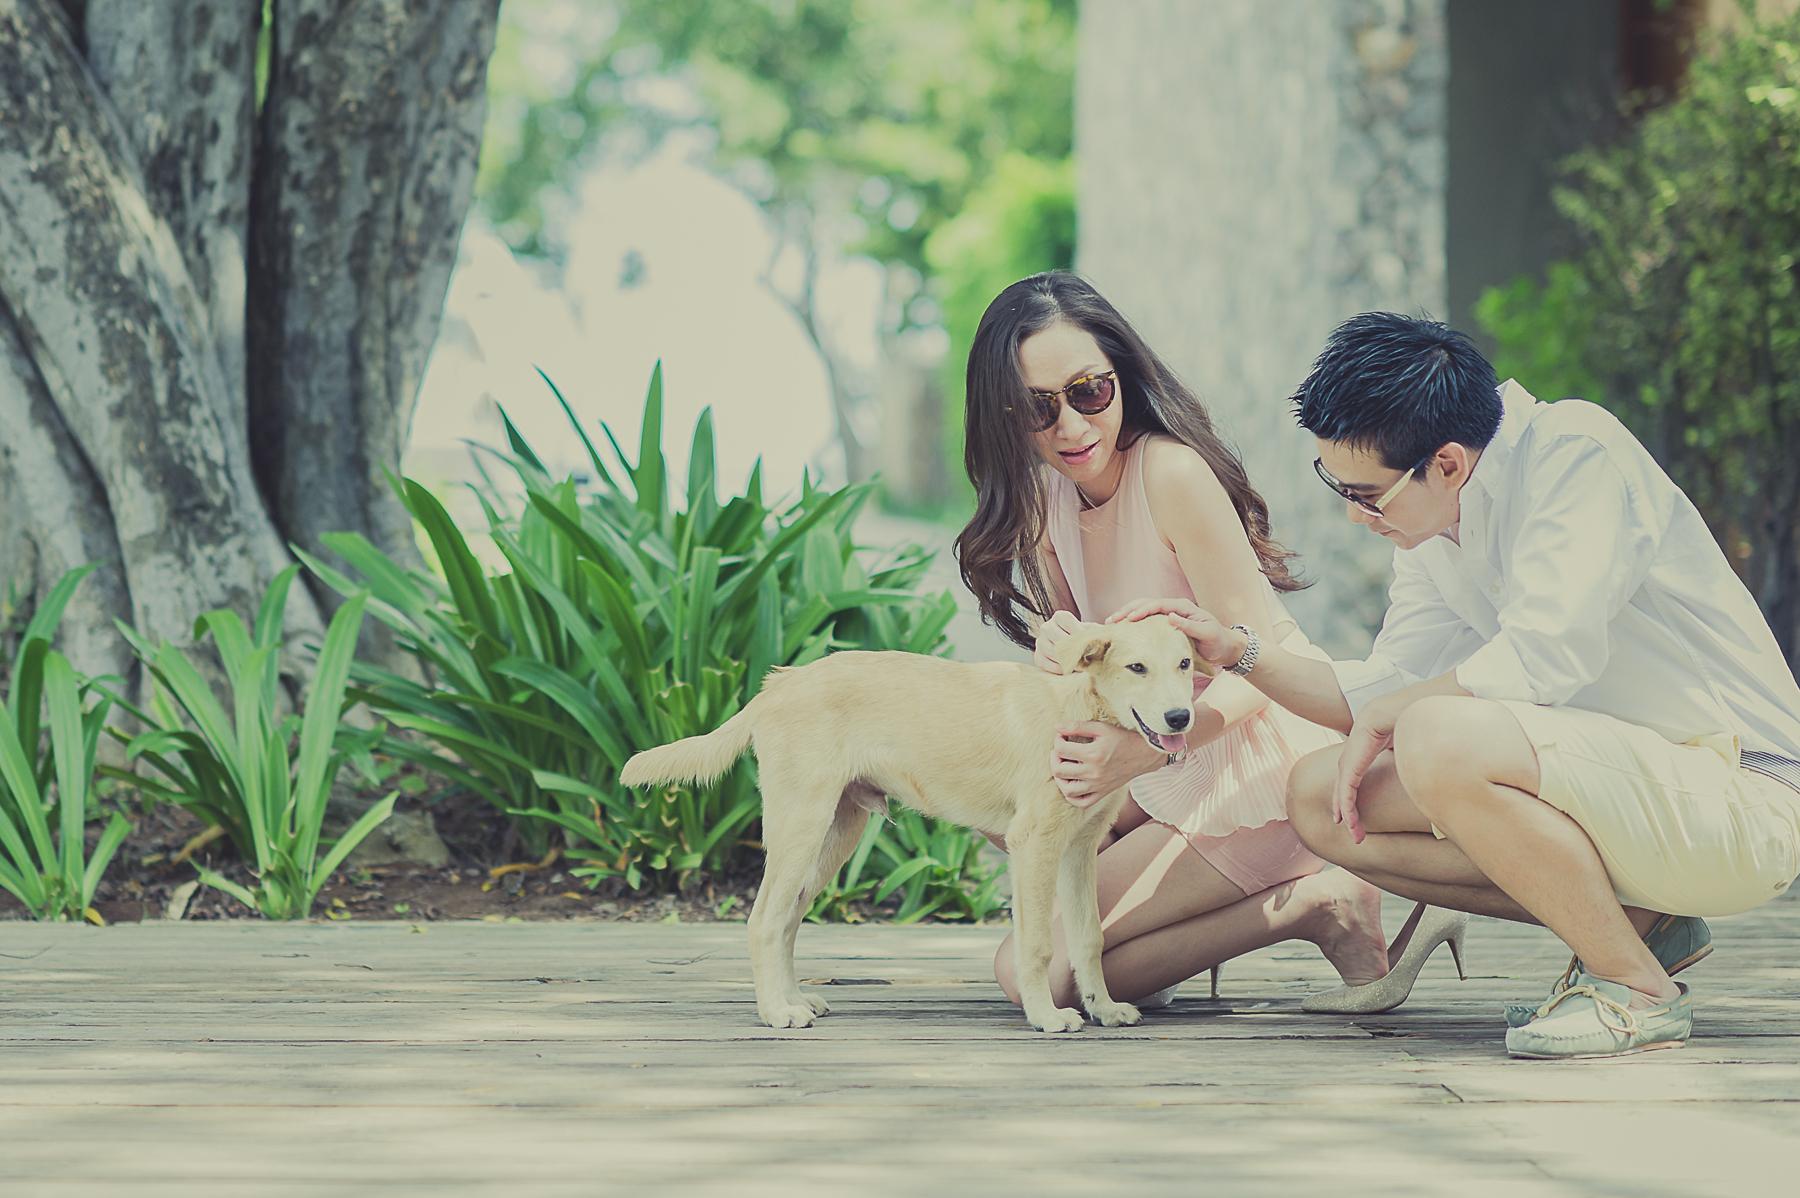 Dogilike.com :: X2 Kui Buri เชิญชวนคนรักสุนัขมาพักผ่อนแบบมีสไตล์ในวิลล่าหรู